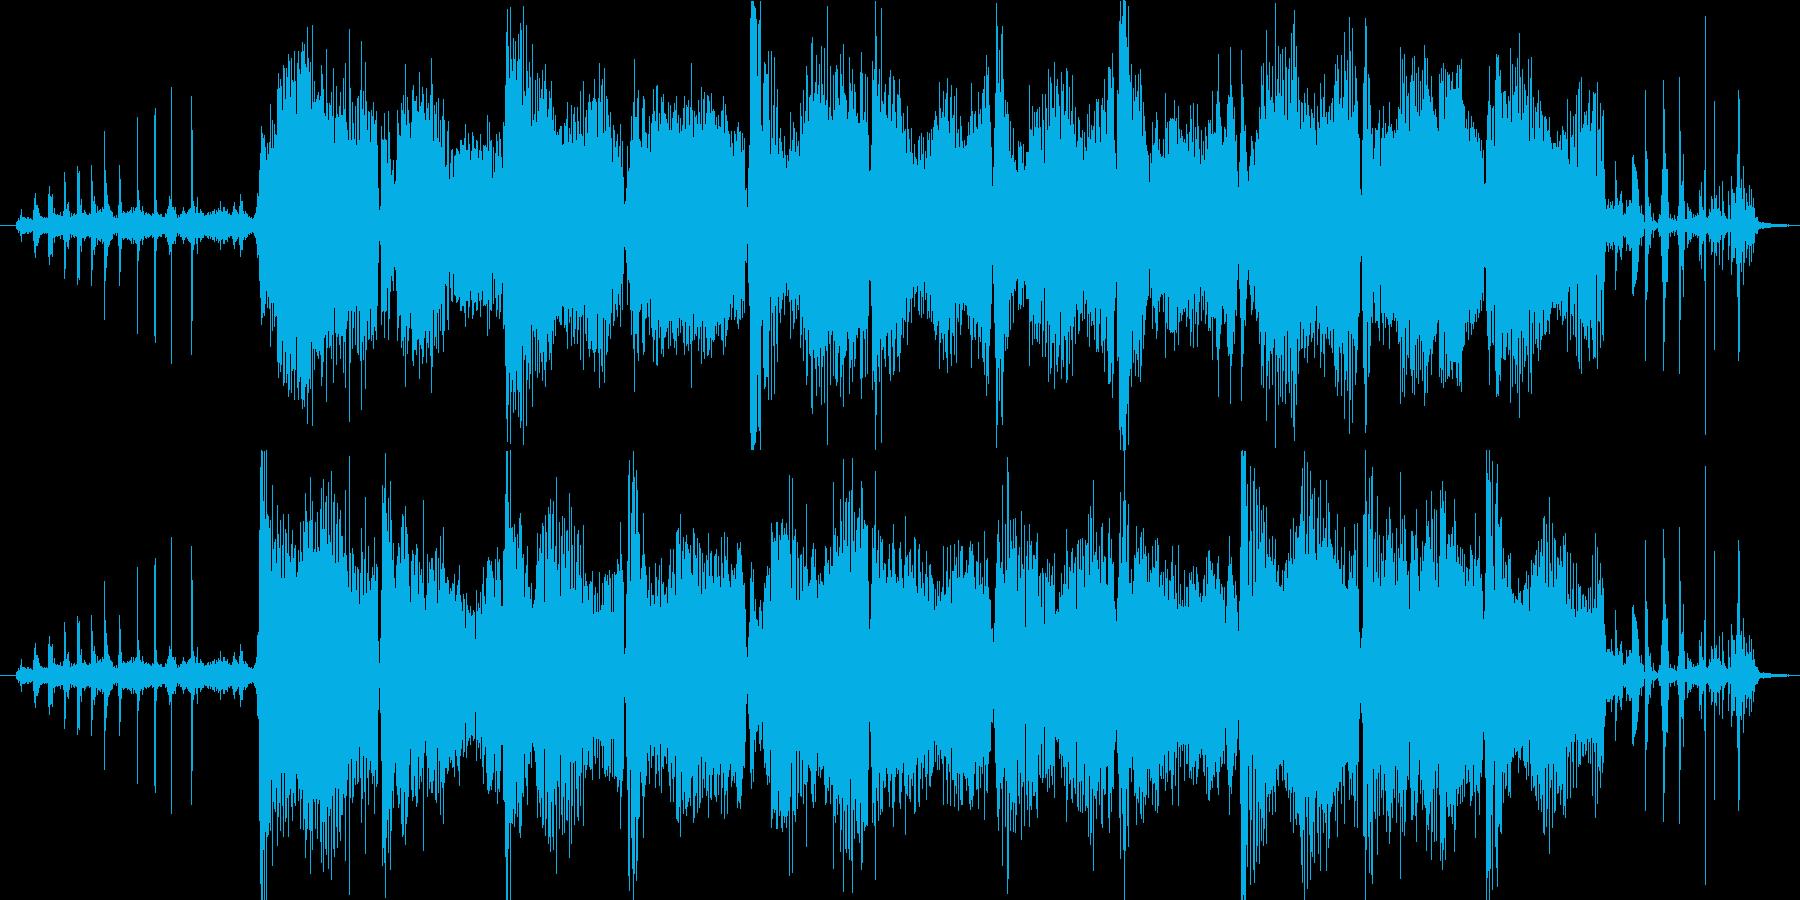 Songの再生済みの波形